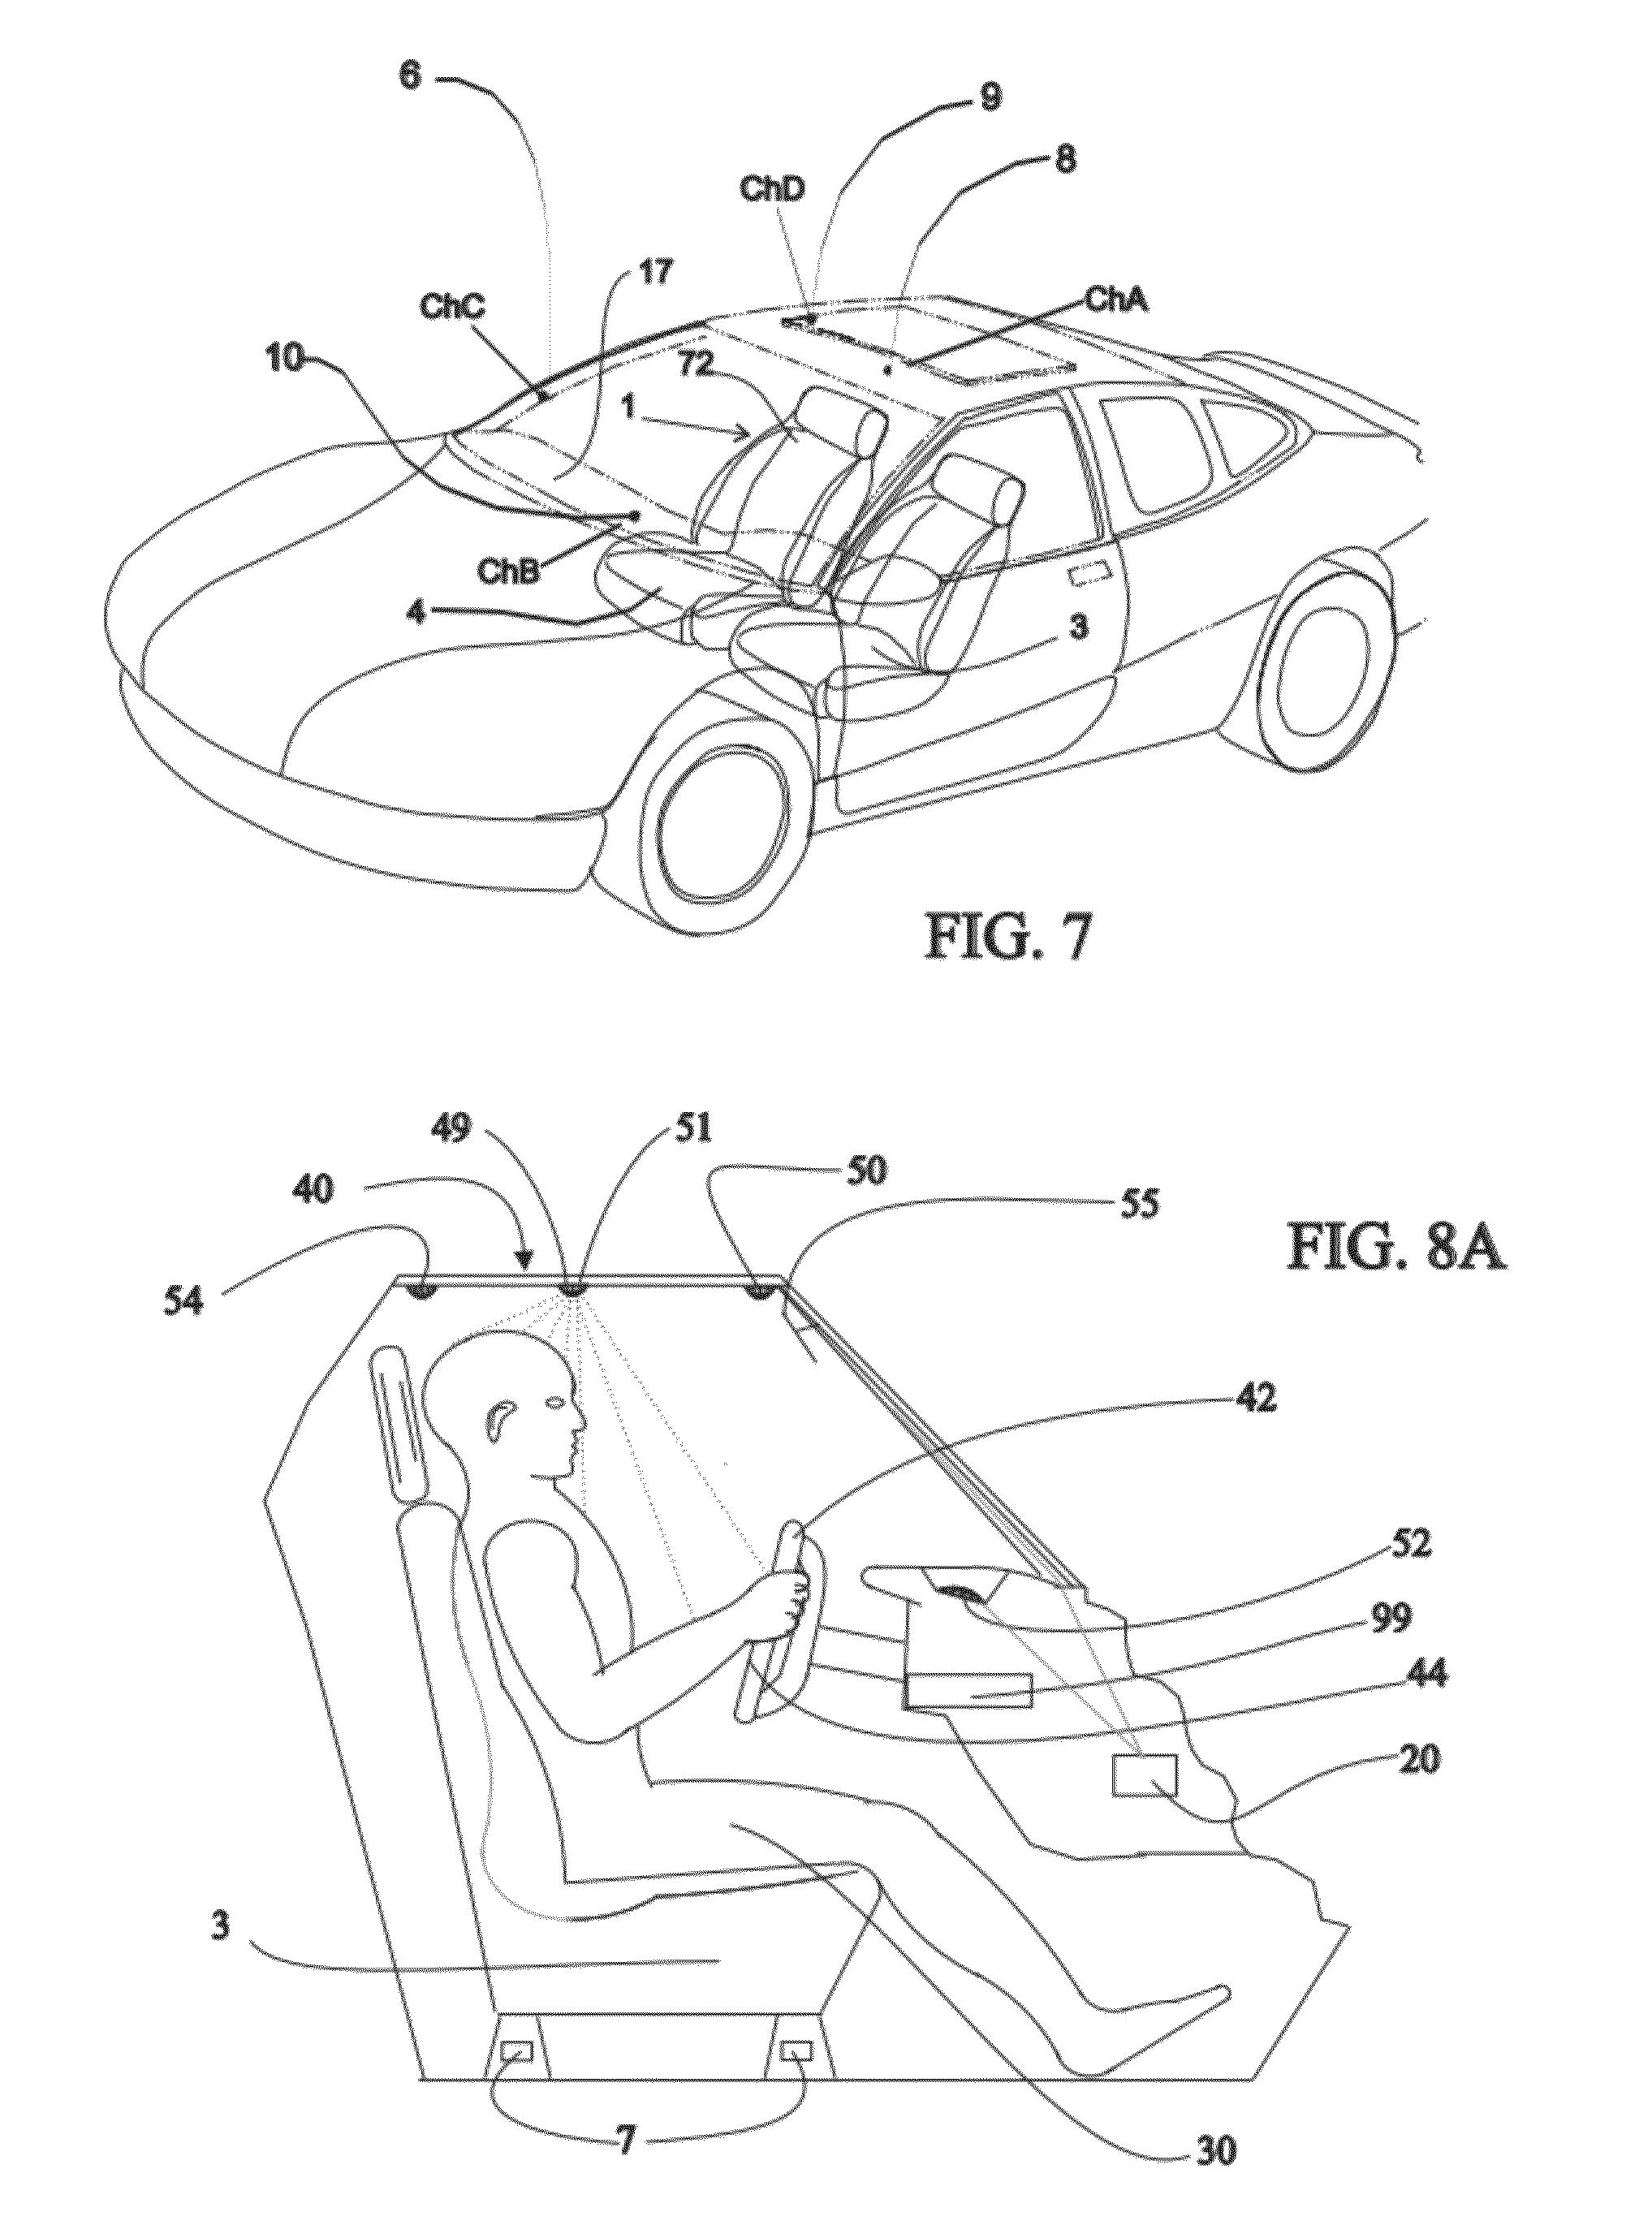 patent us 8 820 782 b2 1961 Chrysler Newport patent